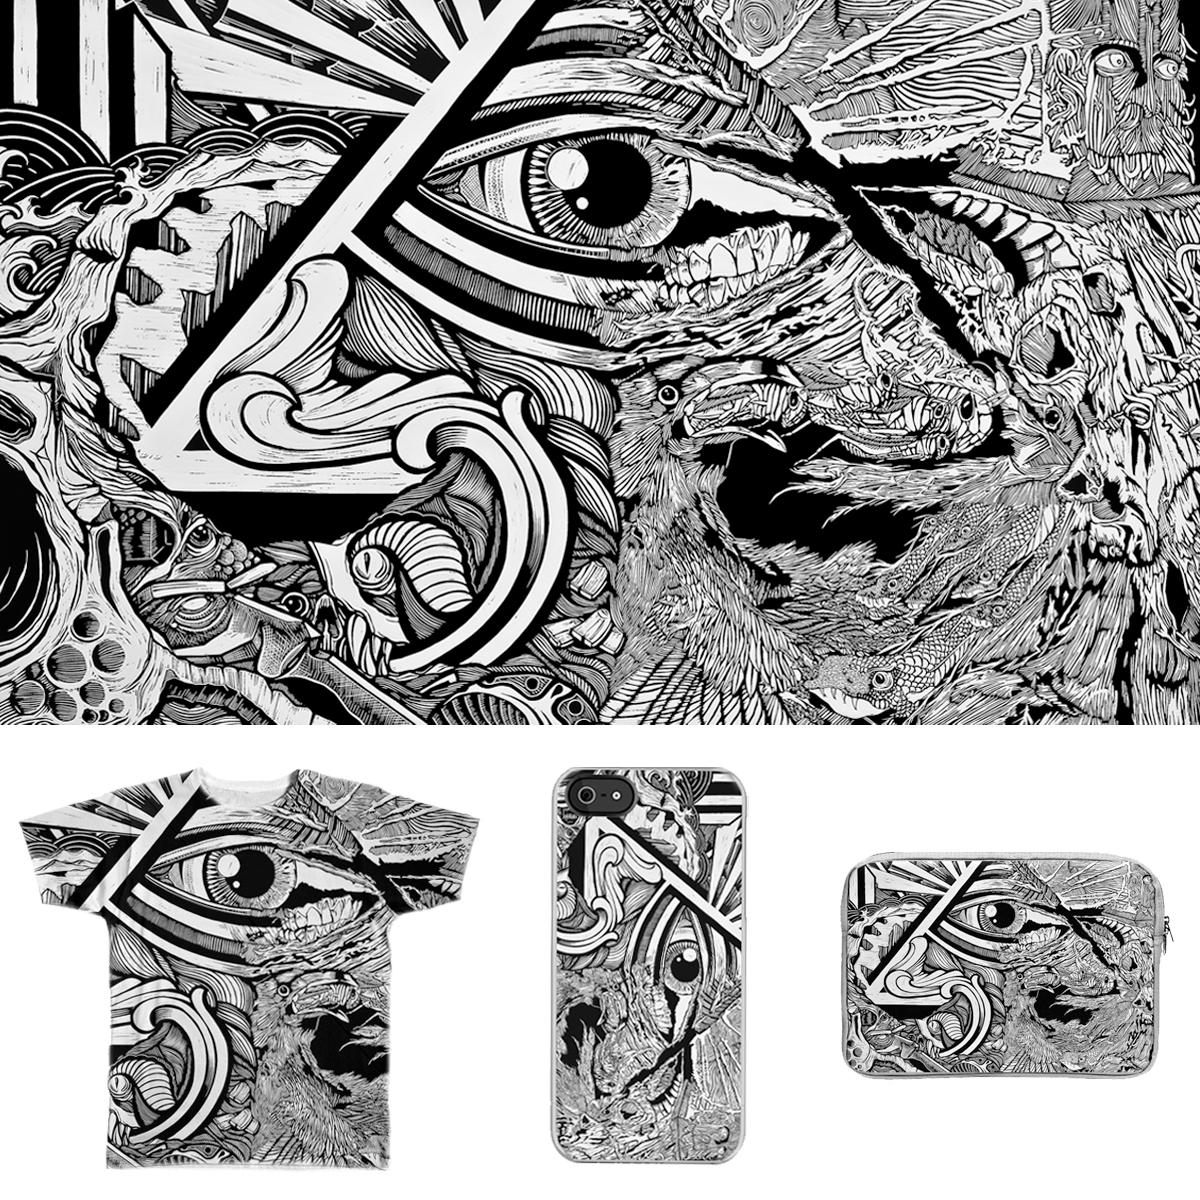 Artist Block by DaNkJiMz on Threadless